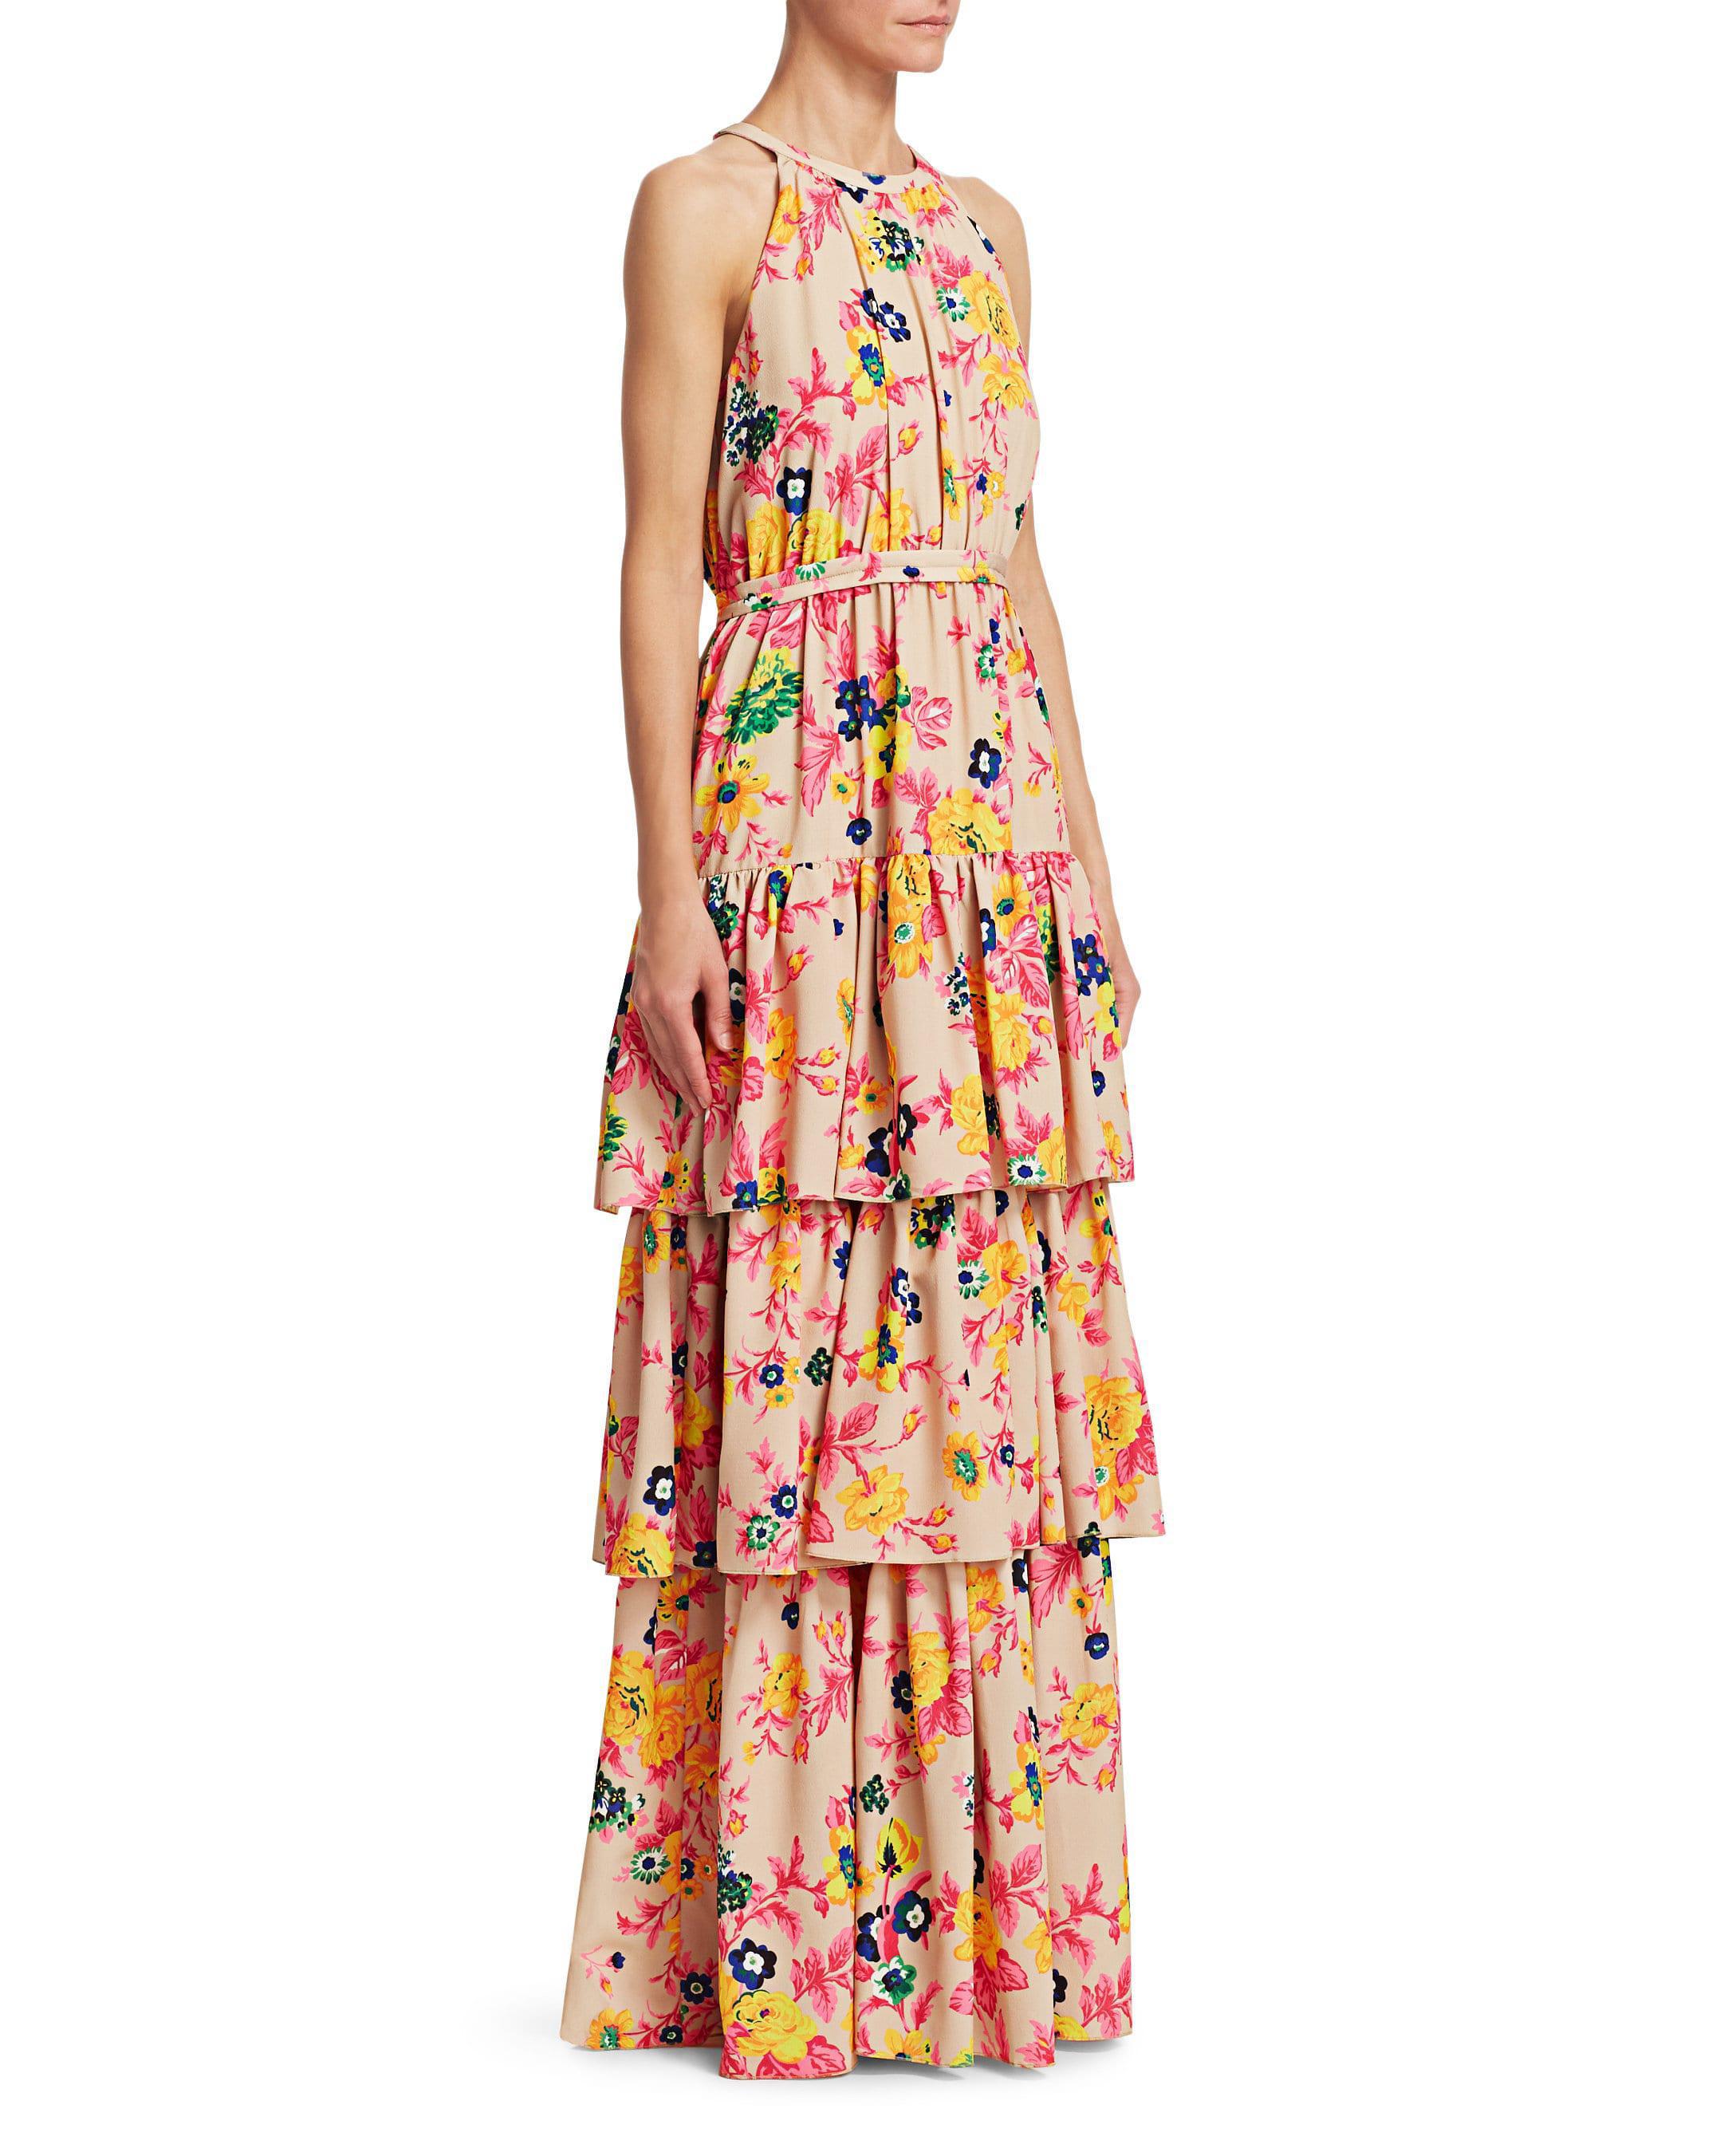 floor length tiered beige dress with multicolor florals